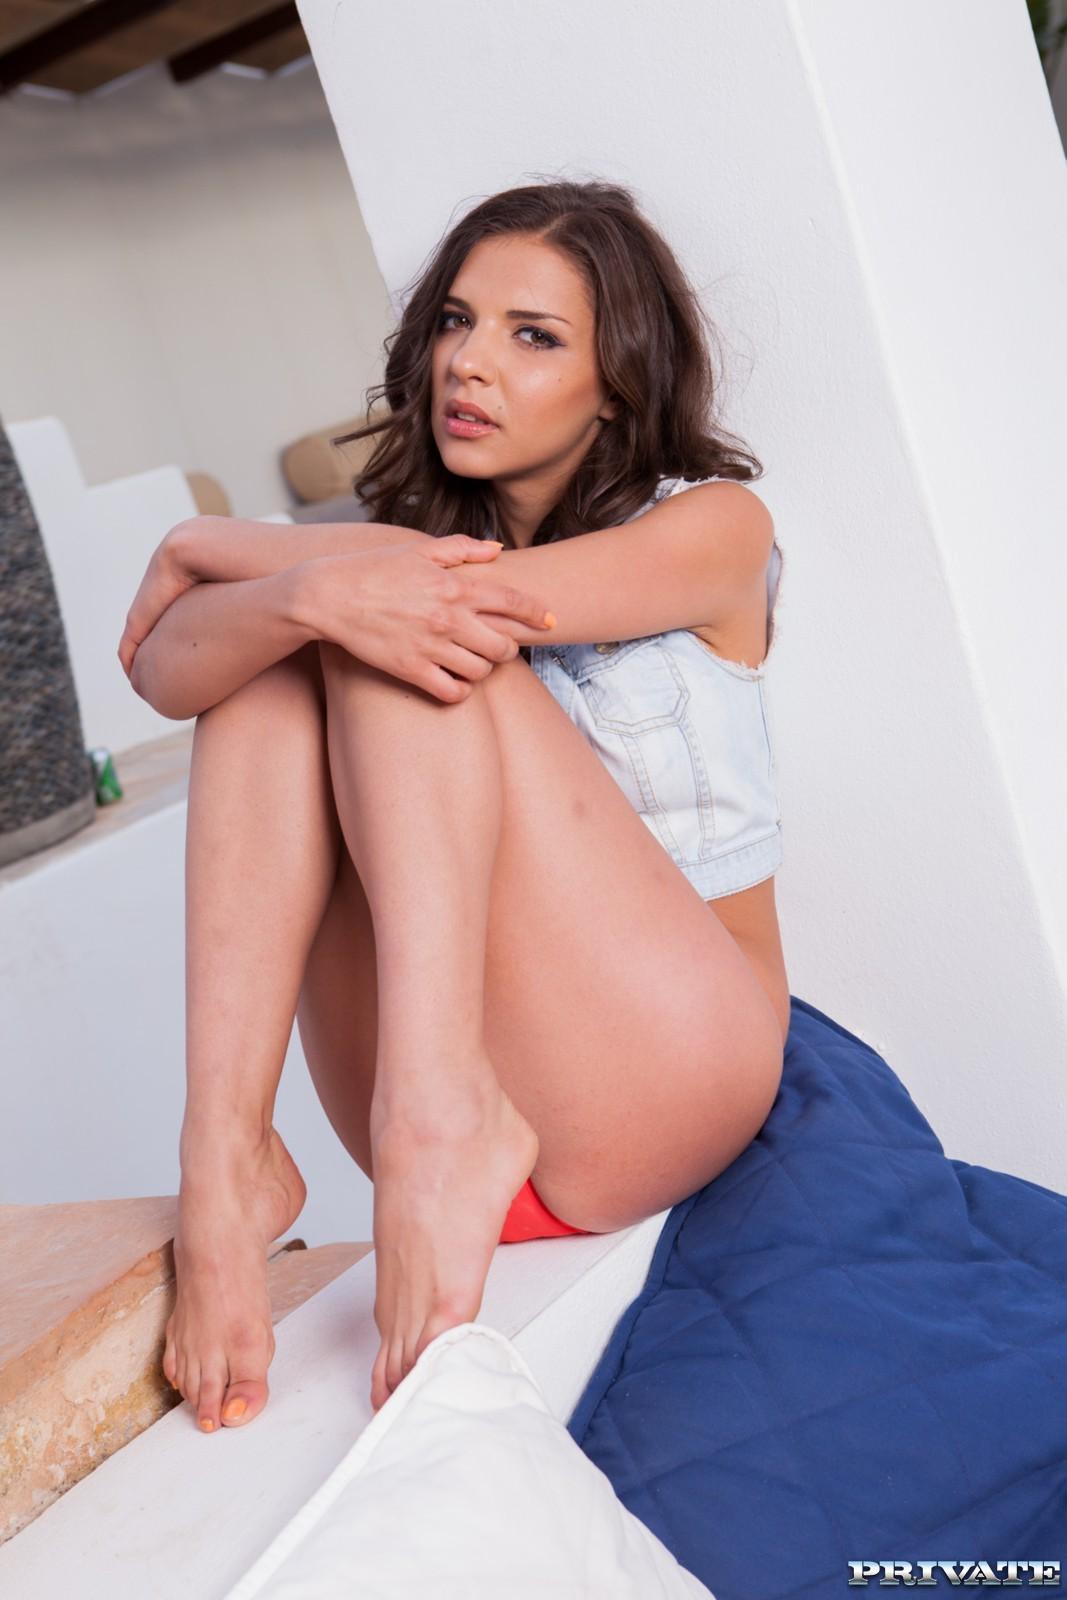 Alina Henessy Porn henessy's feet << wikifeet x